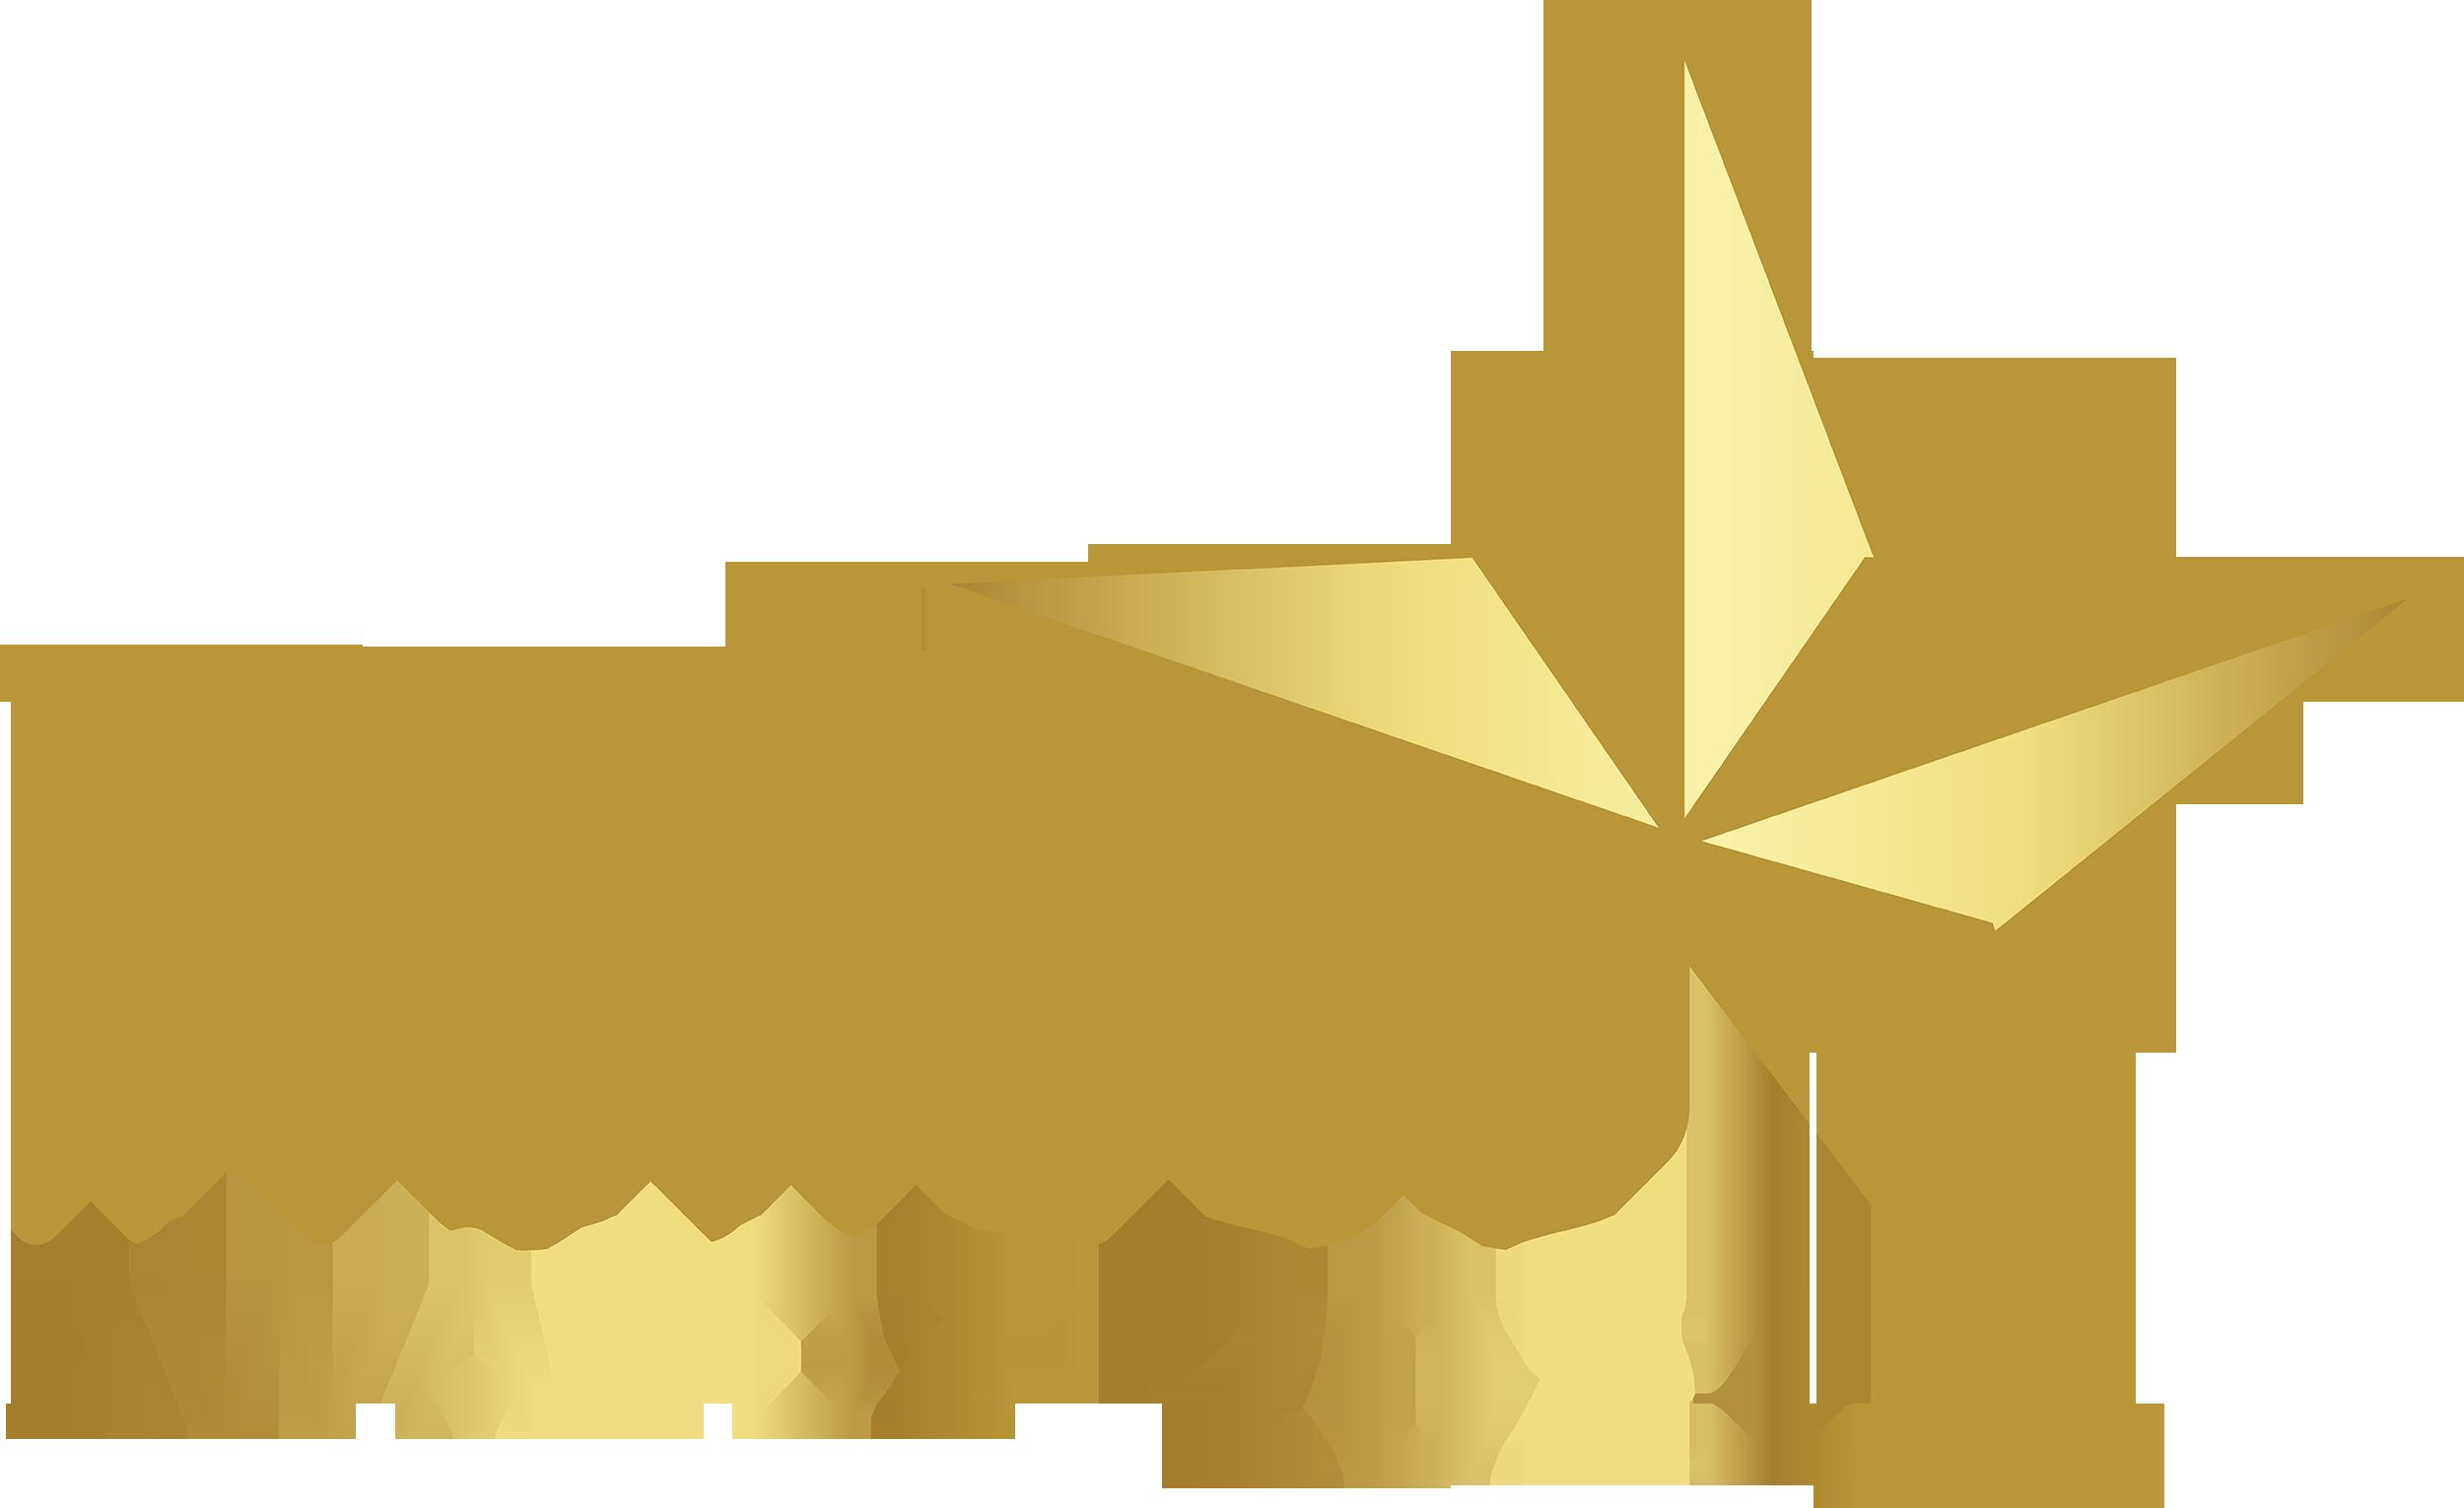 INOMICS Awards 2021 - Top 3 Winners